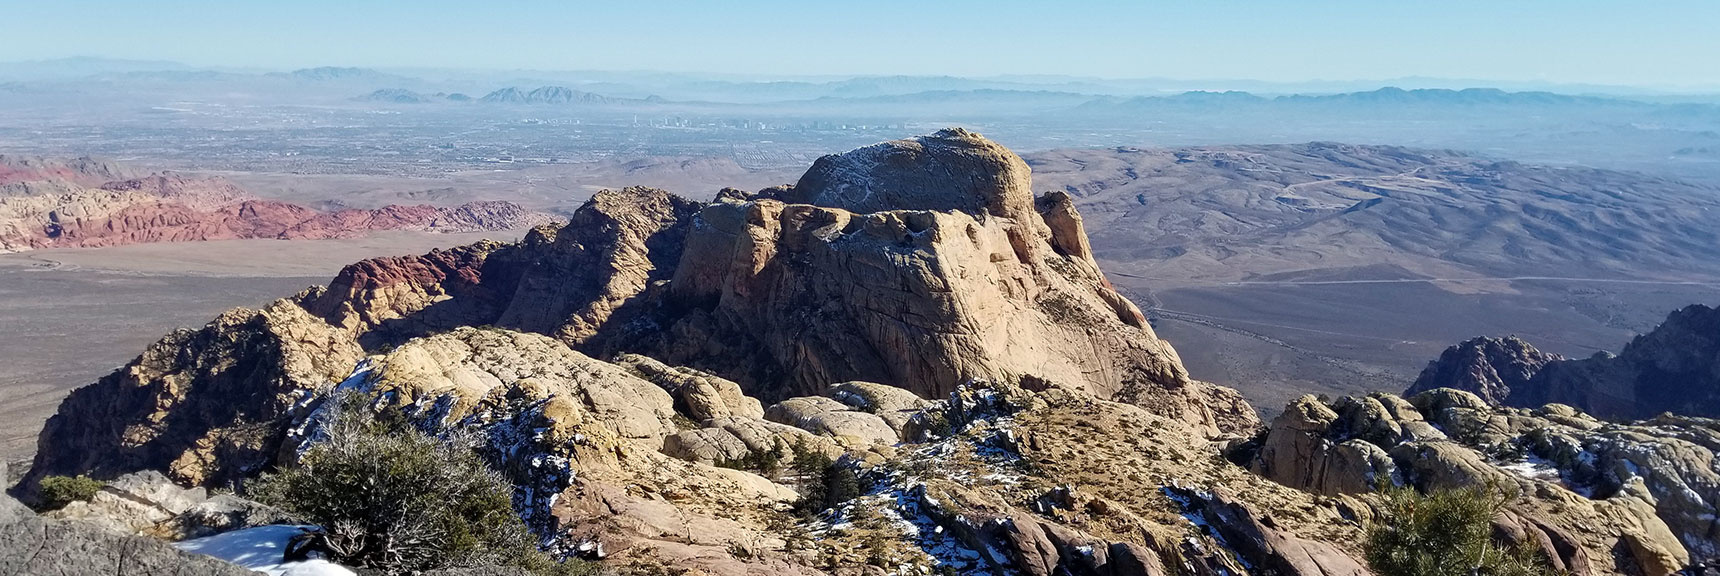 Bridge Mountain and Las Vegas Strip from Goat Rock Summit